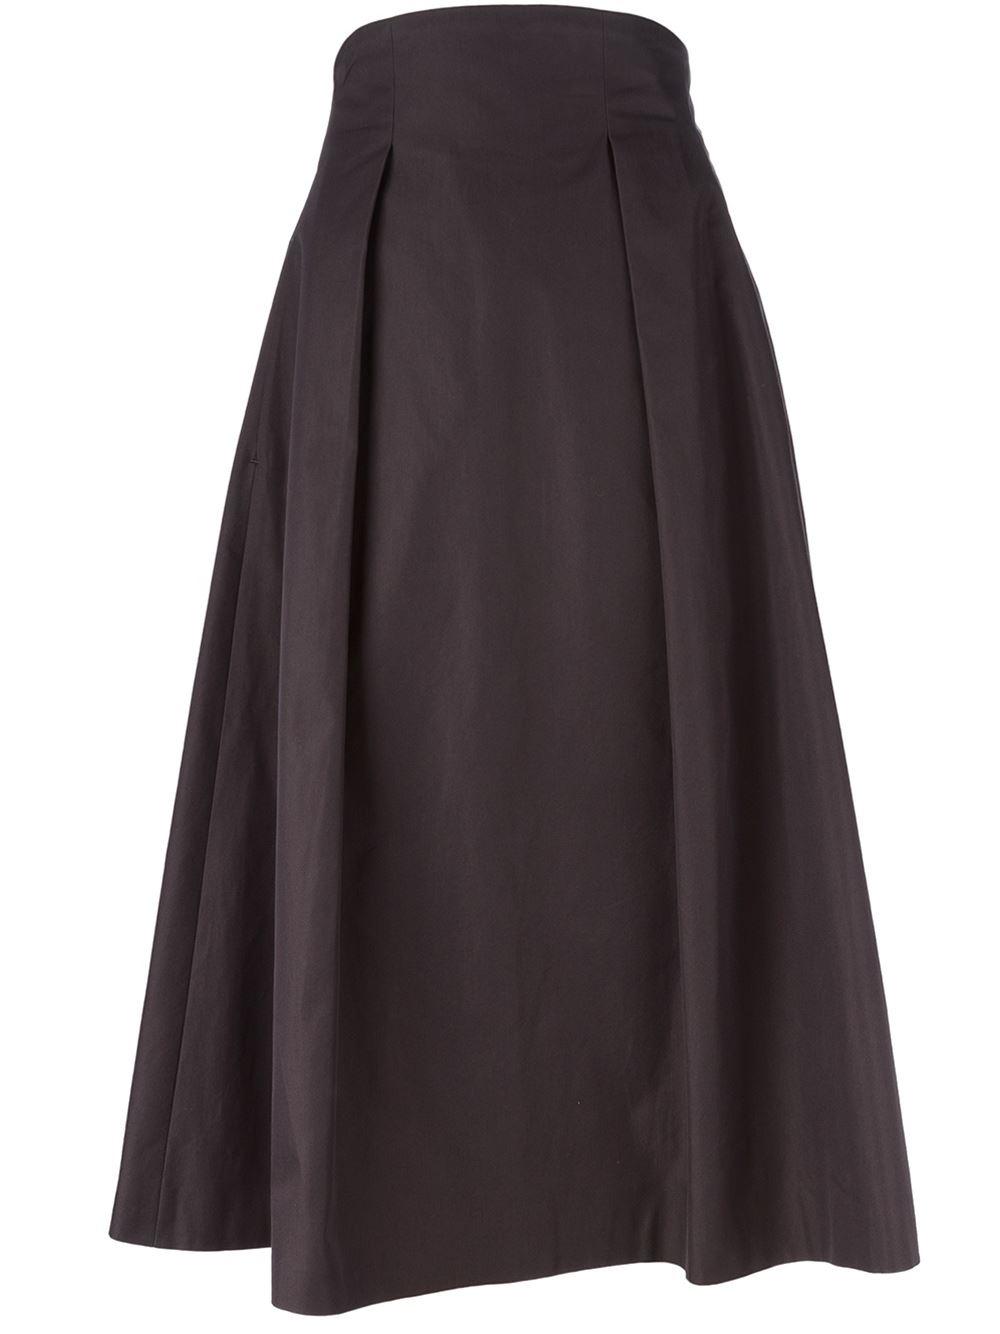 golden goose deluxe brand pleated sides midi skirt in blue